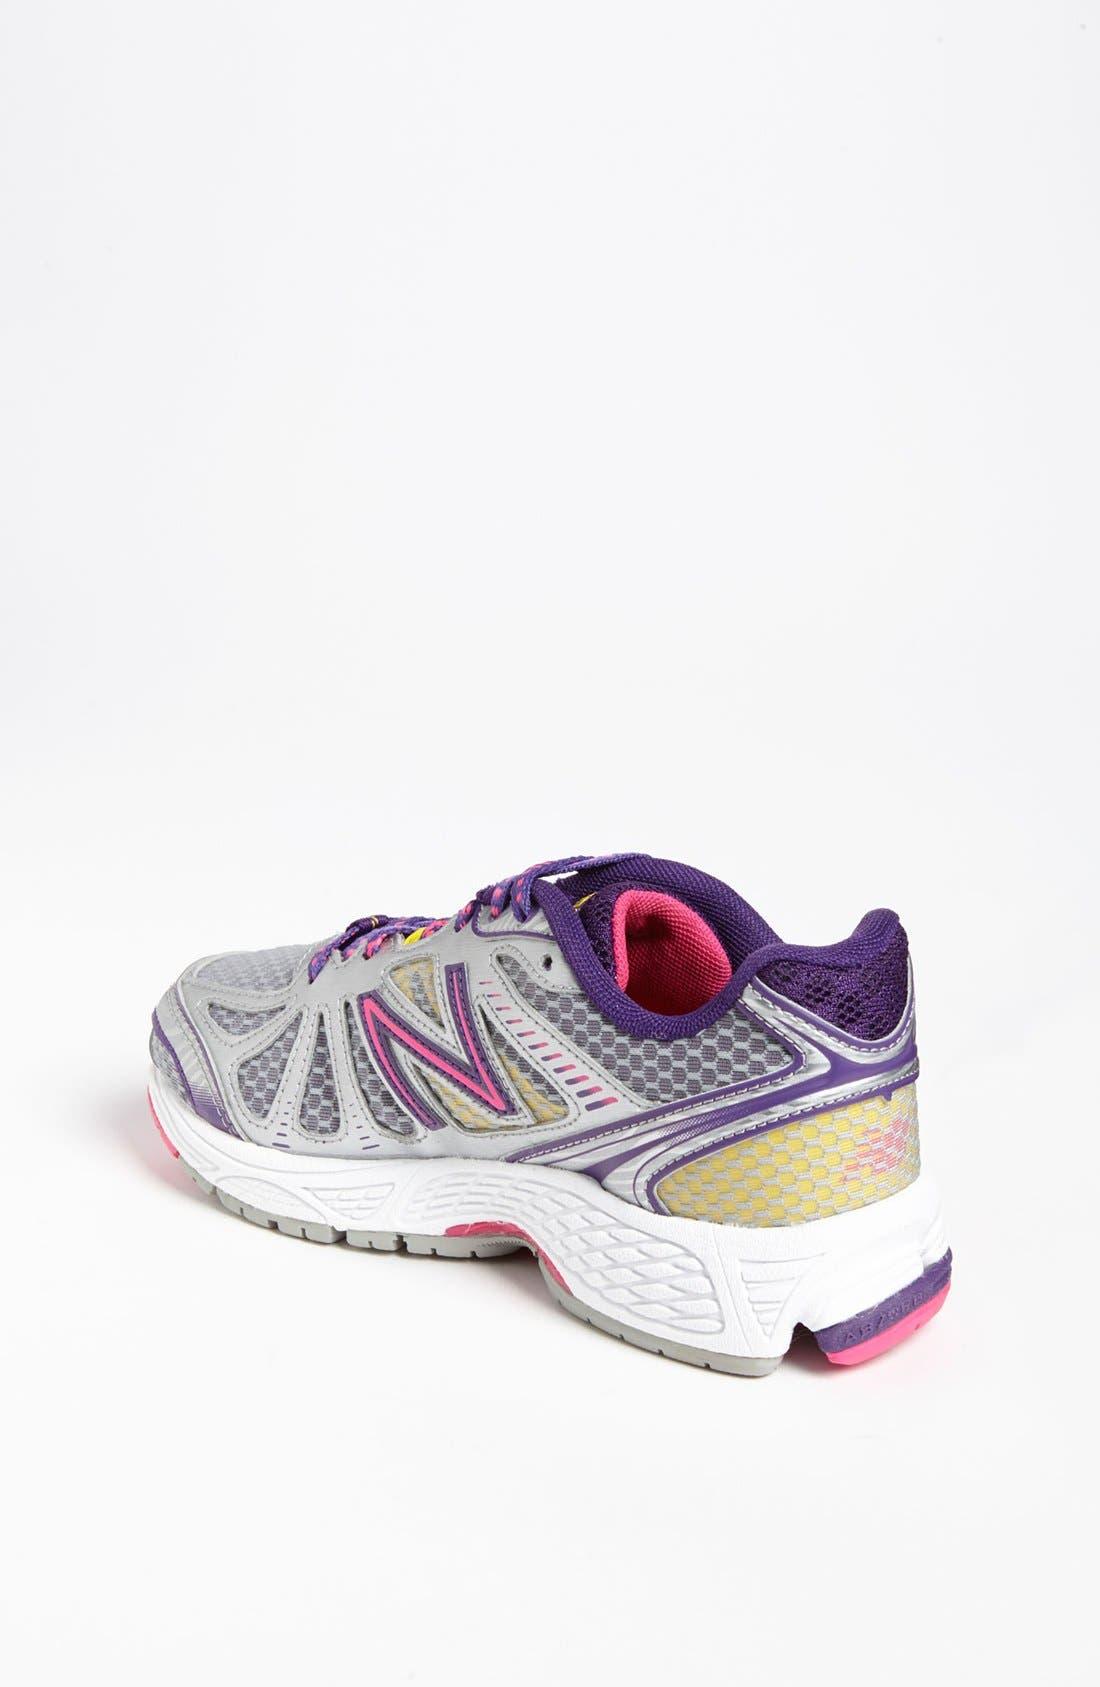 Alternate Image 2  - New Balance 'Take Down 880' Running Shoe (Toddler, Little Kid & Big Kid) (Online Only)